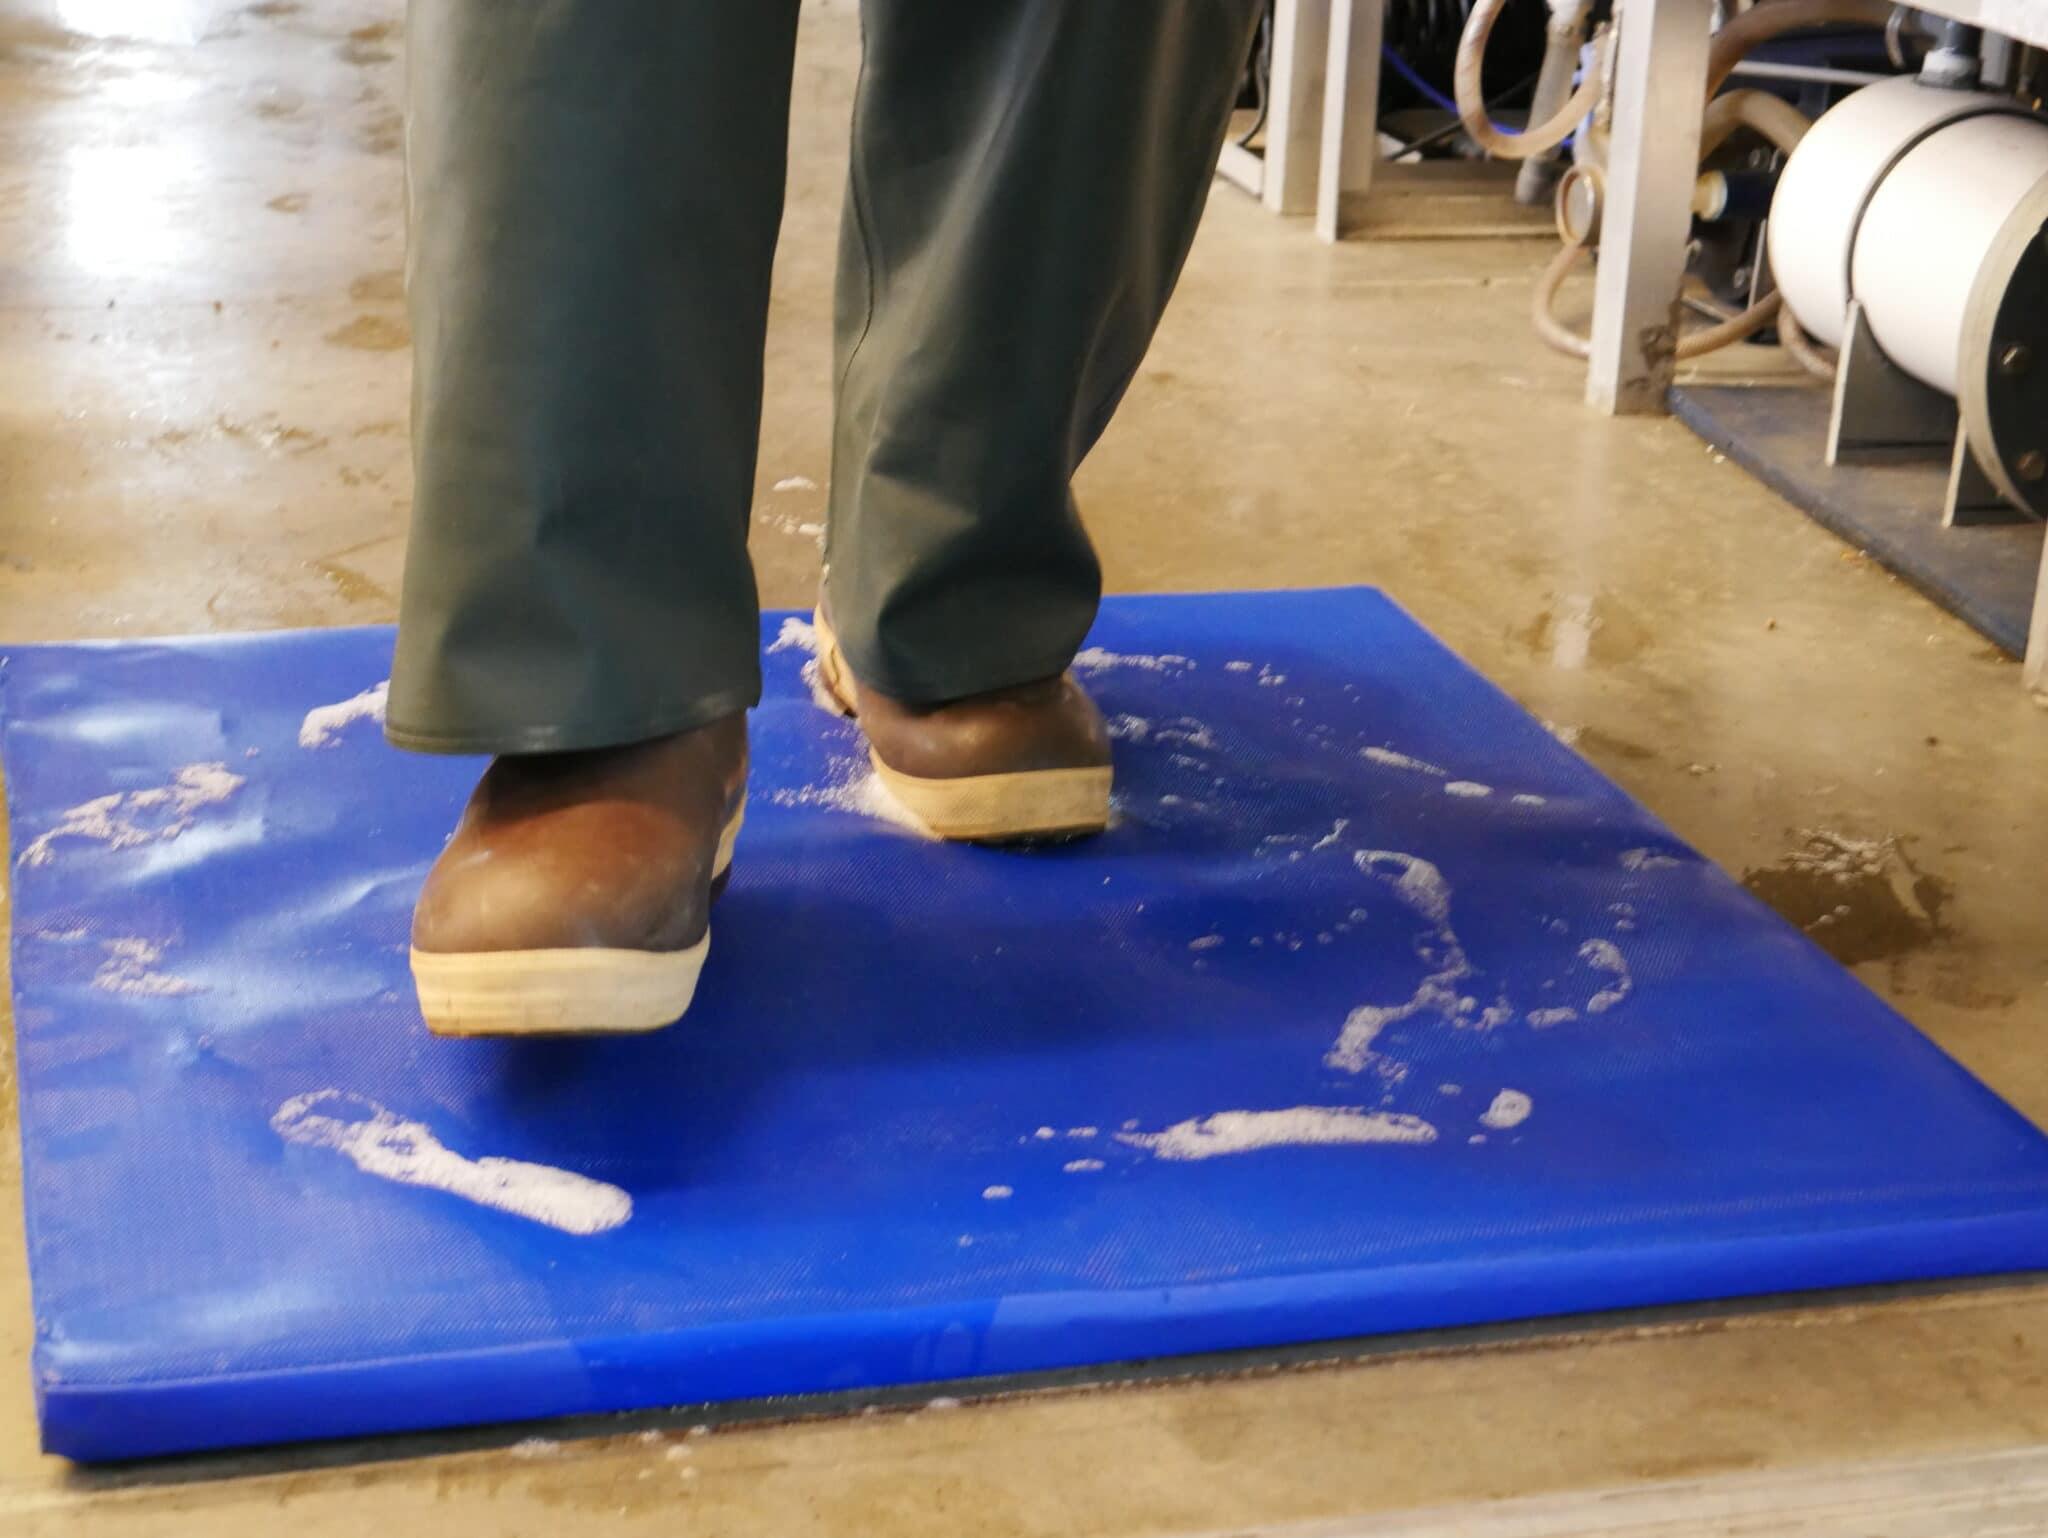 Foam Biosecurity Footbath Boot Disinfection Sanitizing Footmat Syndel